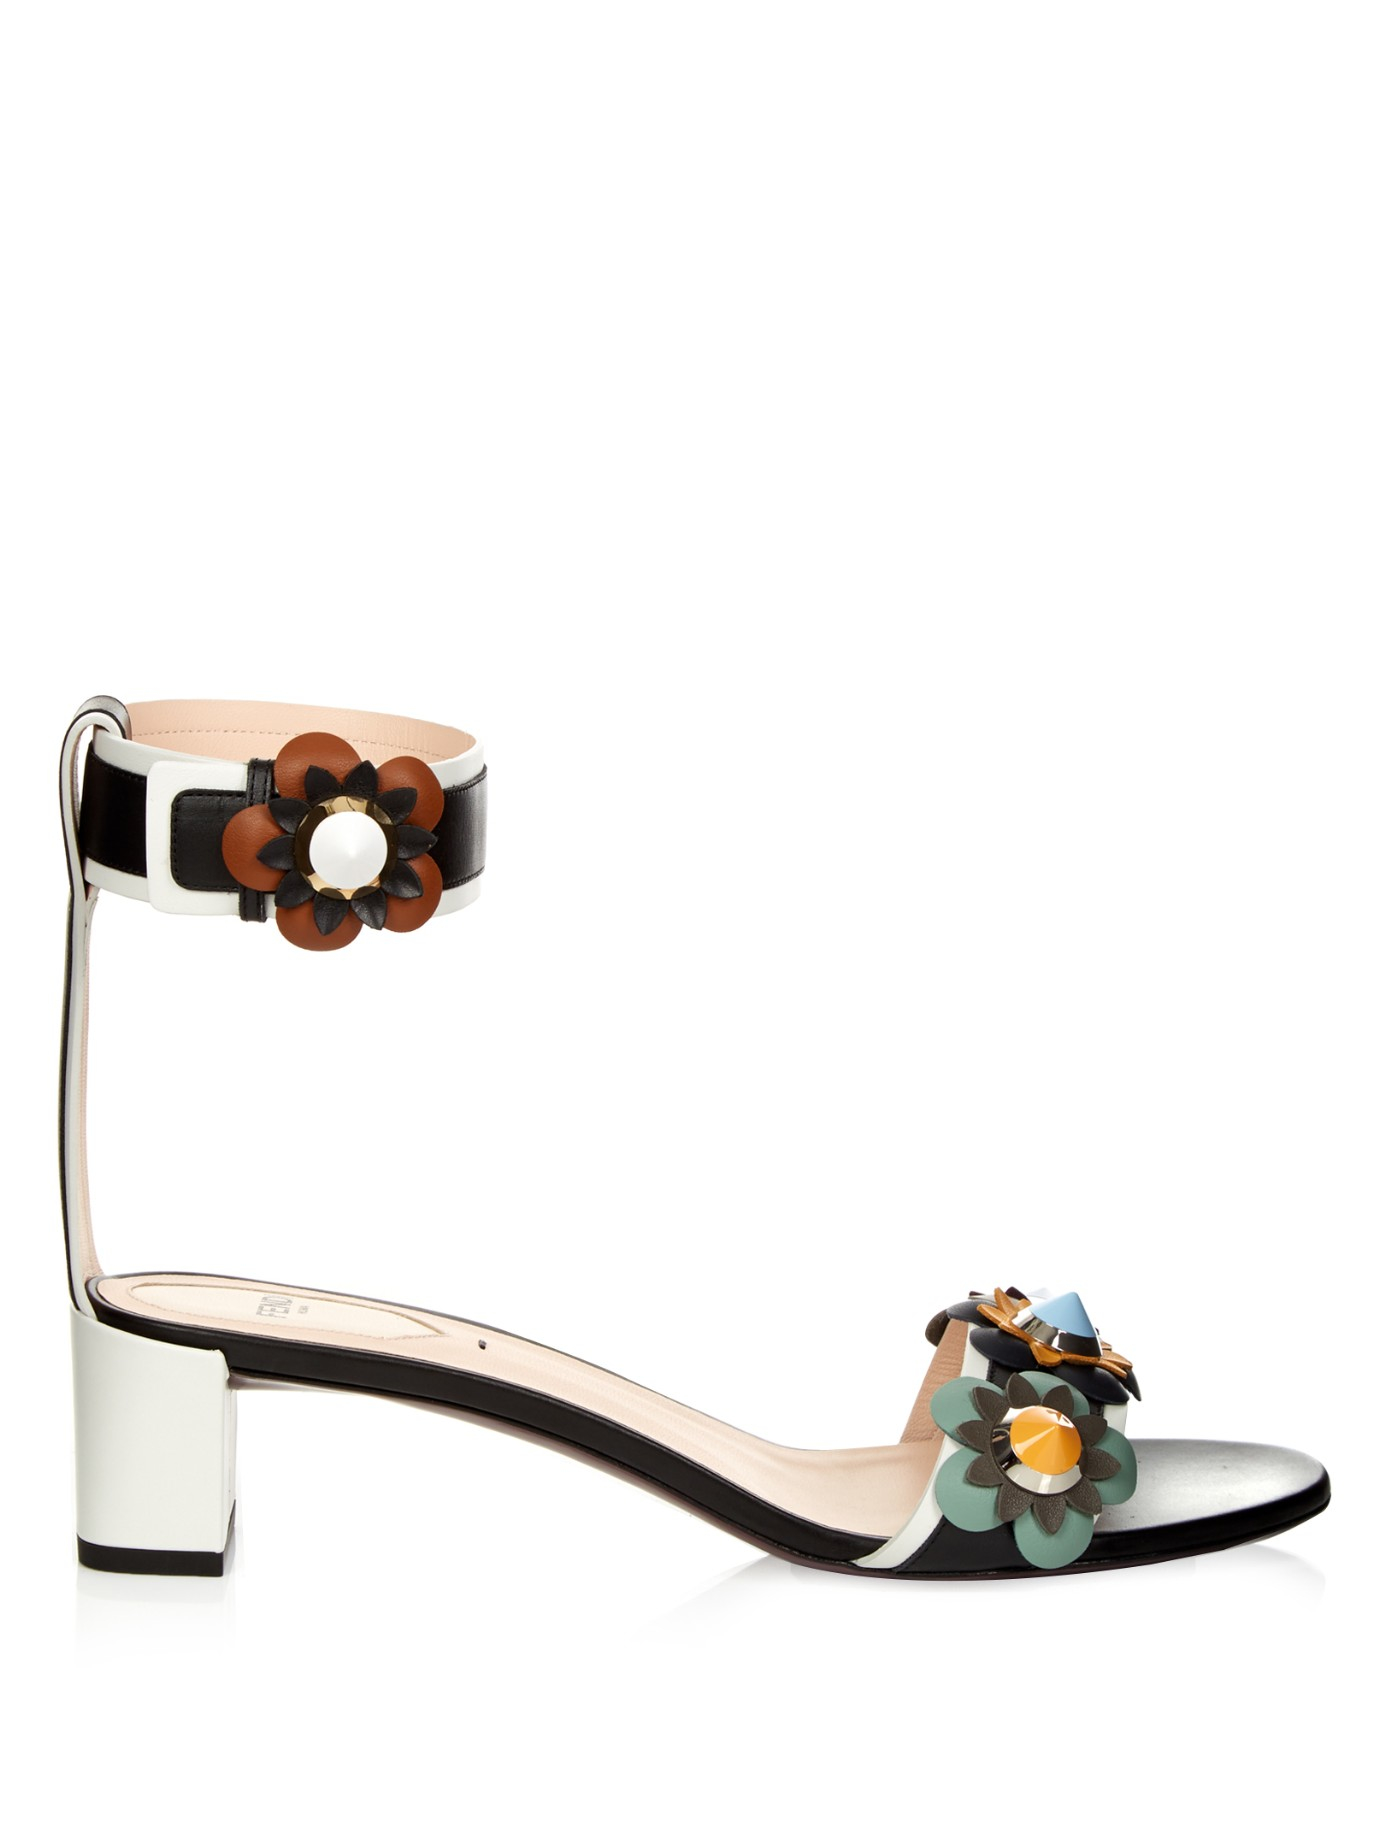 cb68625cb2c8 Lyst - Fendi Flowerland Leather Sandals in Black